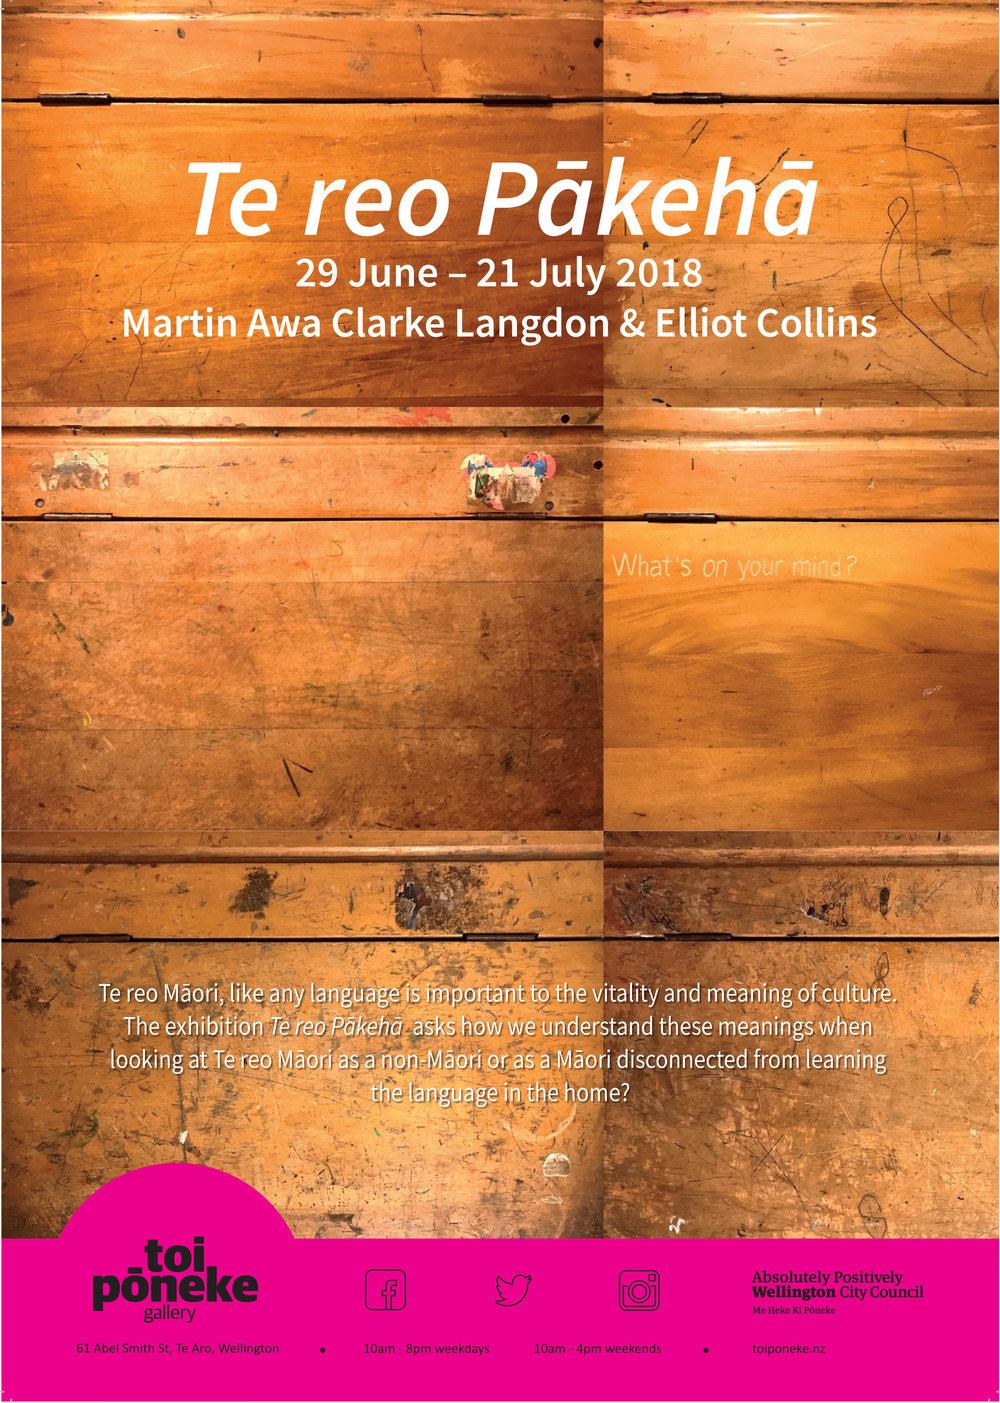 Te reo Pākeha - with Martin Awa Clarke Langdon